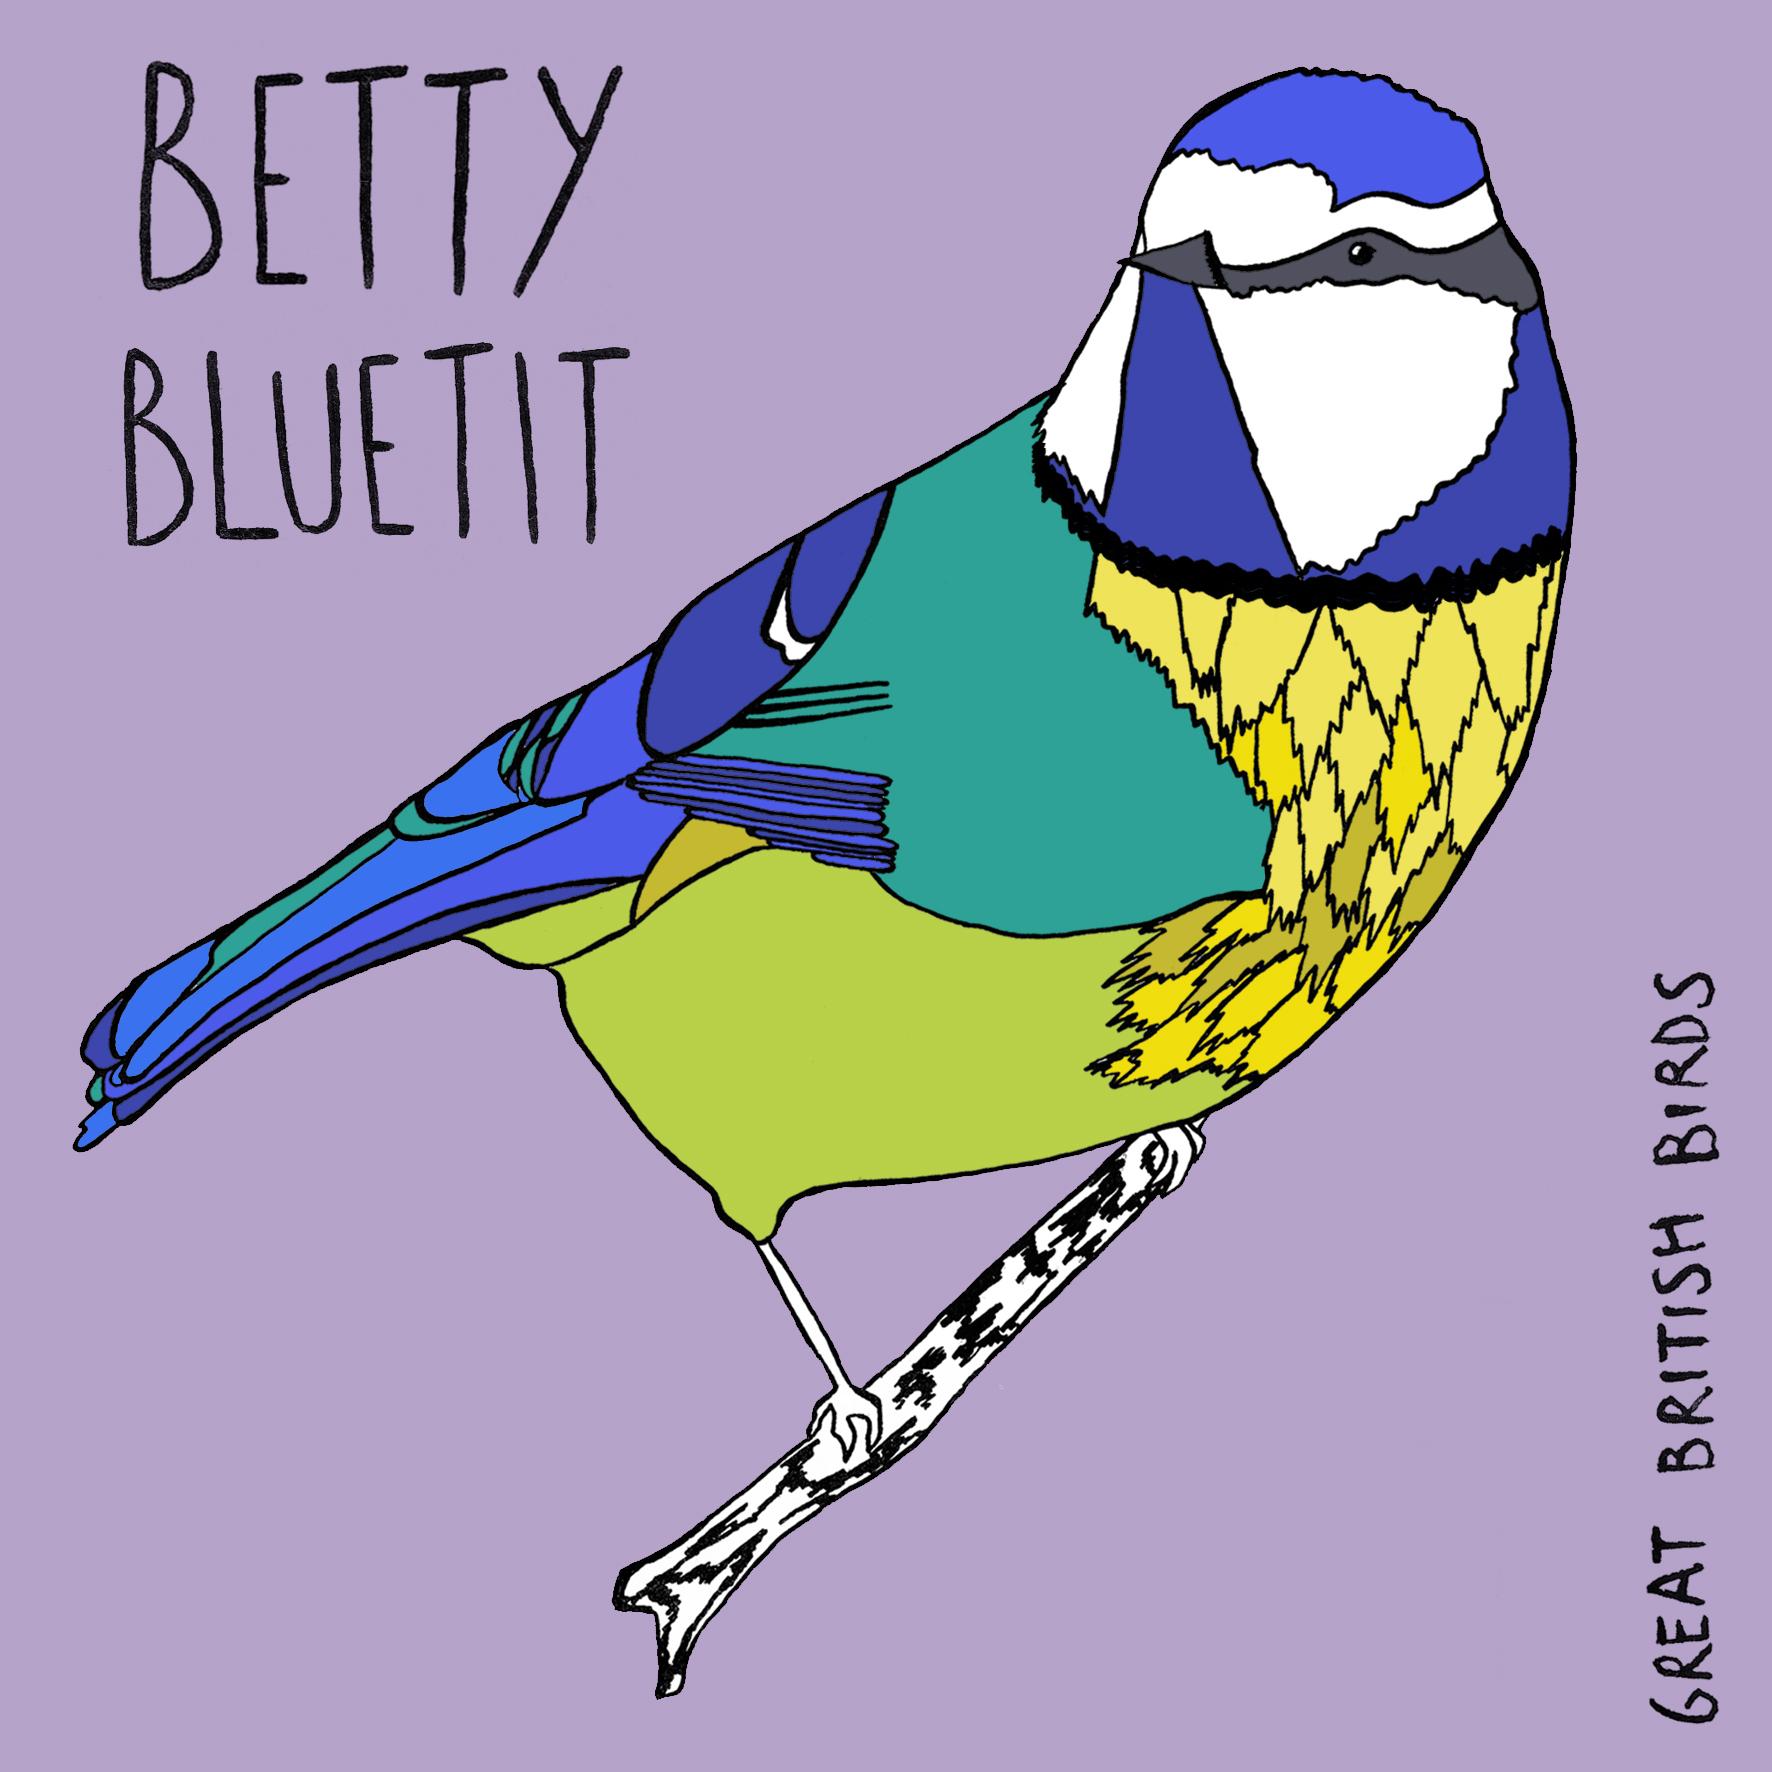 Betty Bluetit.jpg